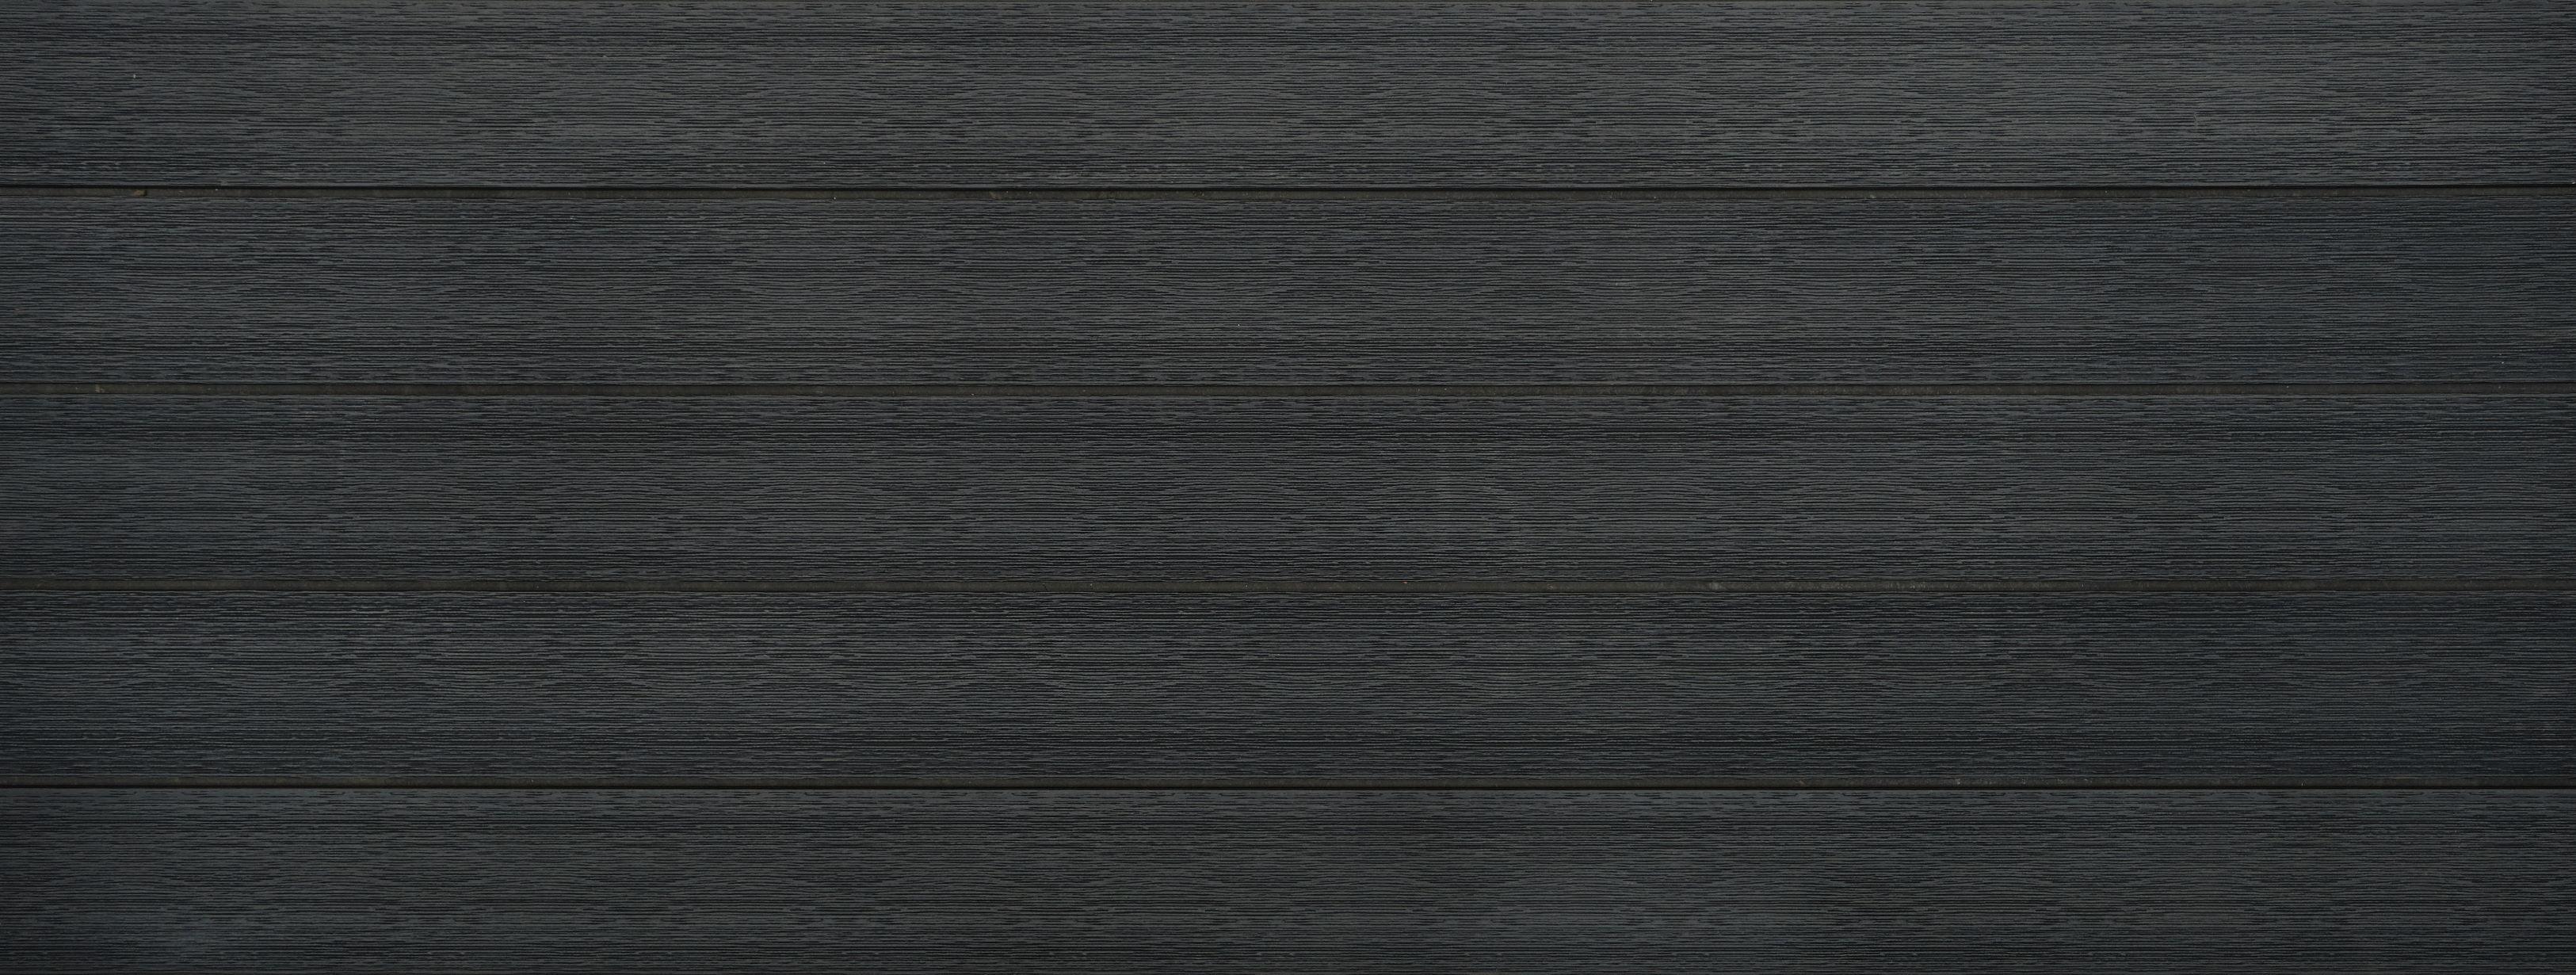 massiv Prime dunkelgrau - gebürstet